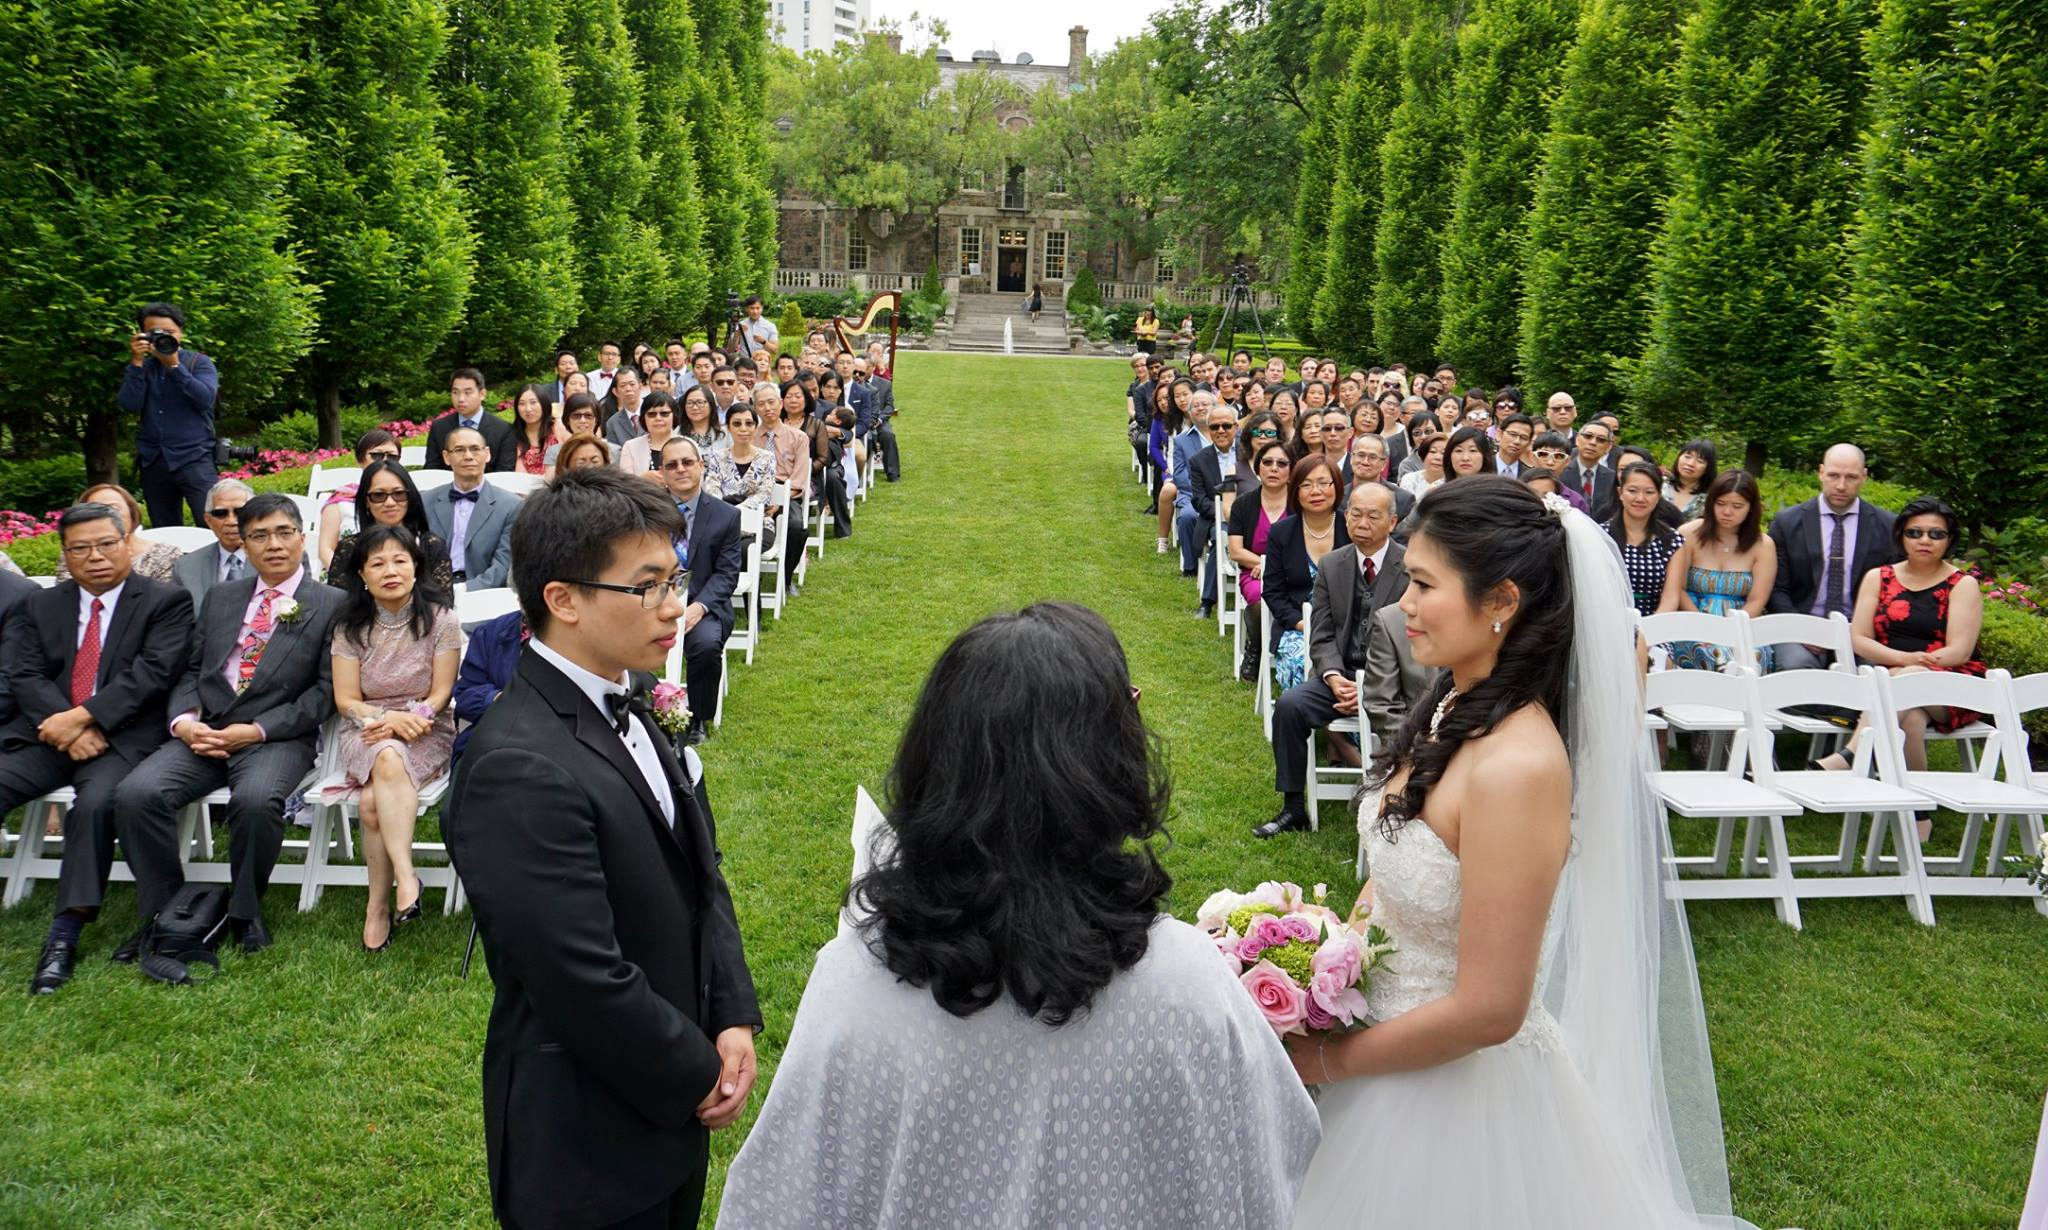 Dream Wedding Officiants, Wedding Heaven, All Seasons Weddings, Wedding Officiant Canada